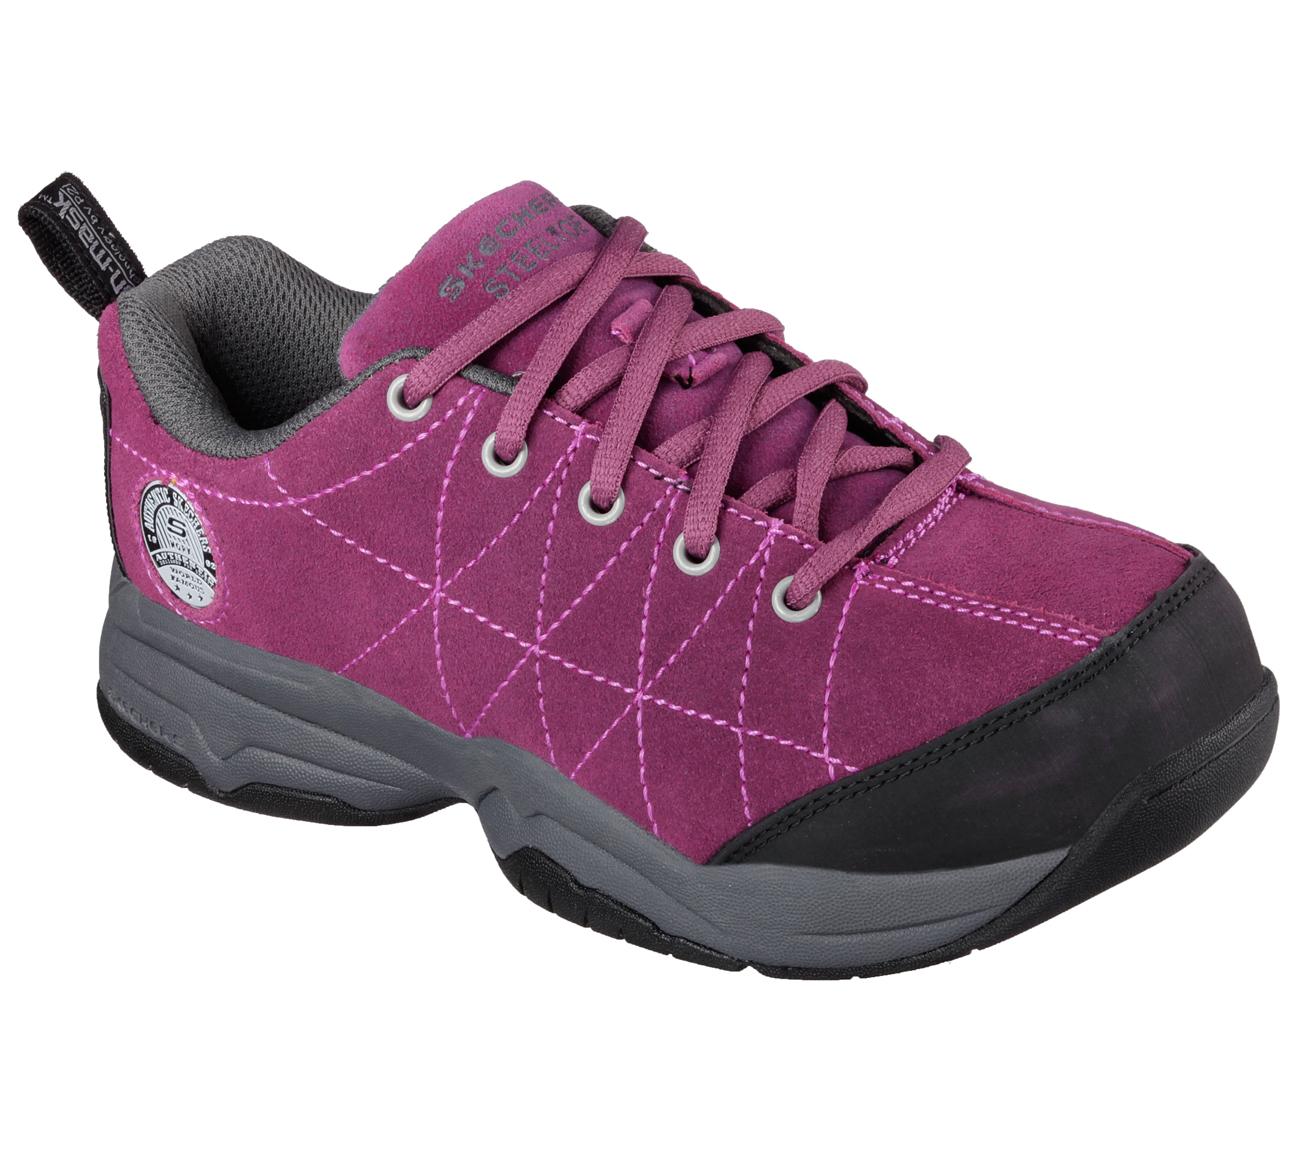 Women's Composite Toe Work Boots 113